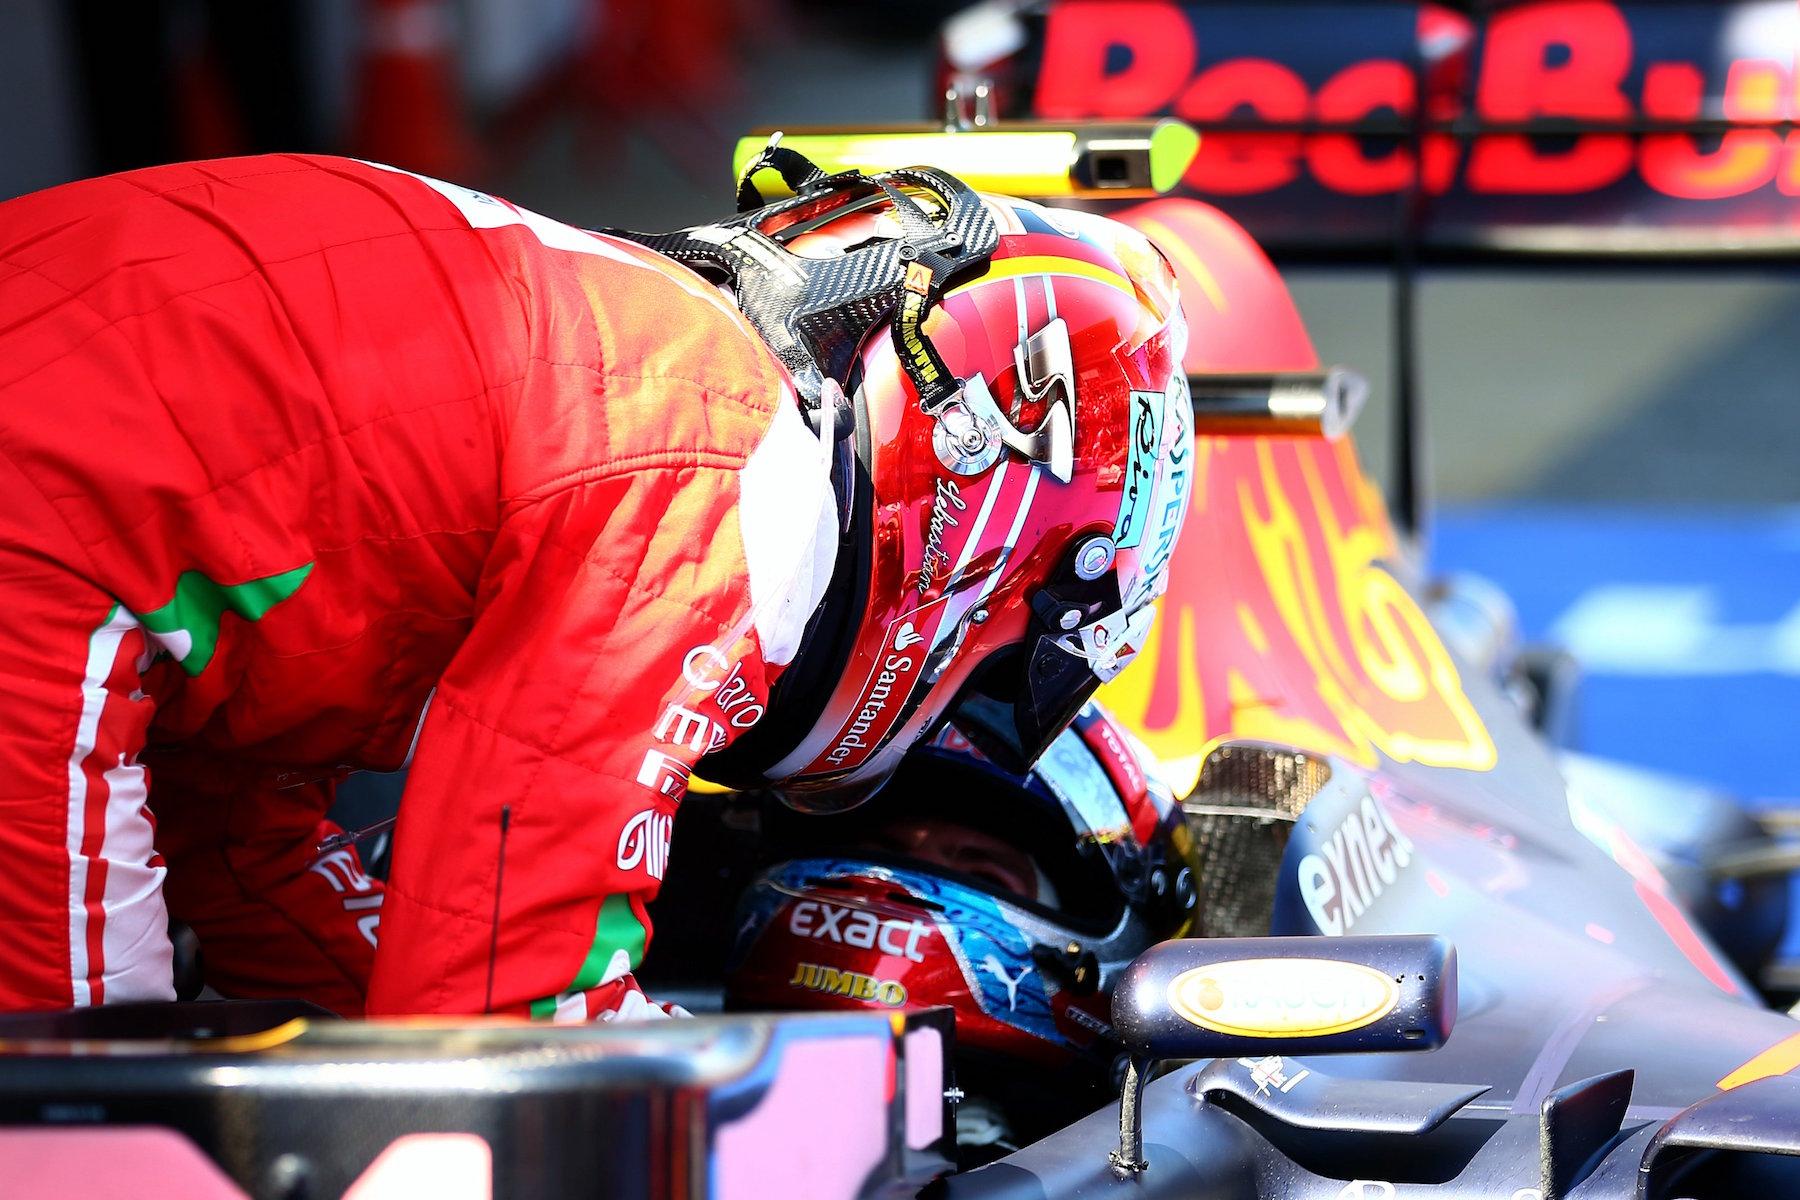 Salracing   Kimi Raikkonen congratulating Max Verstappen